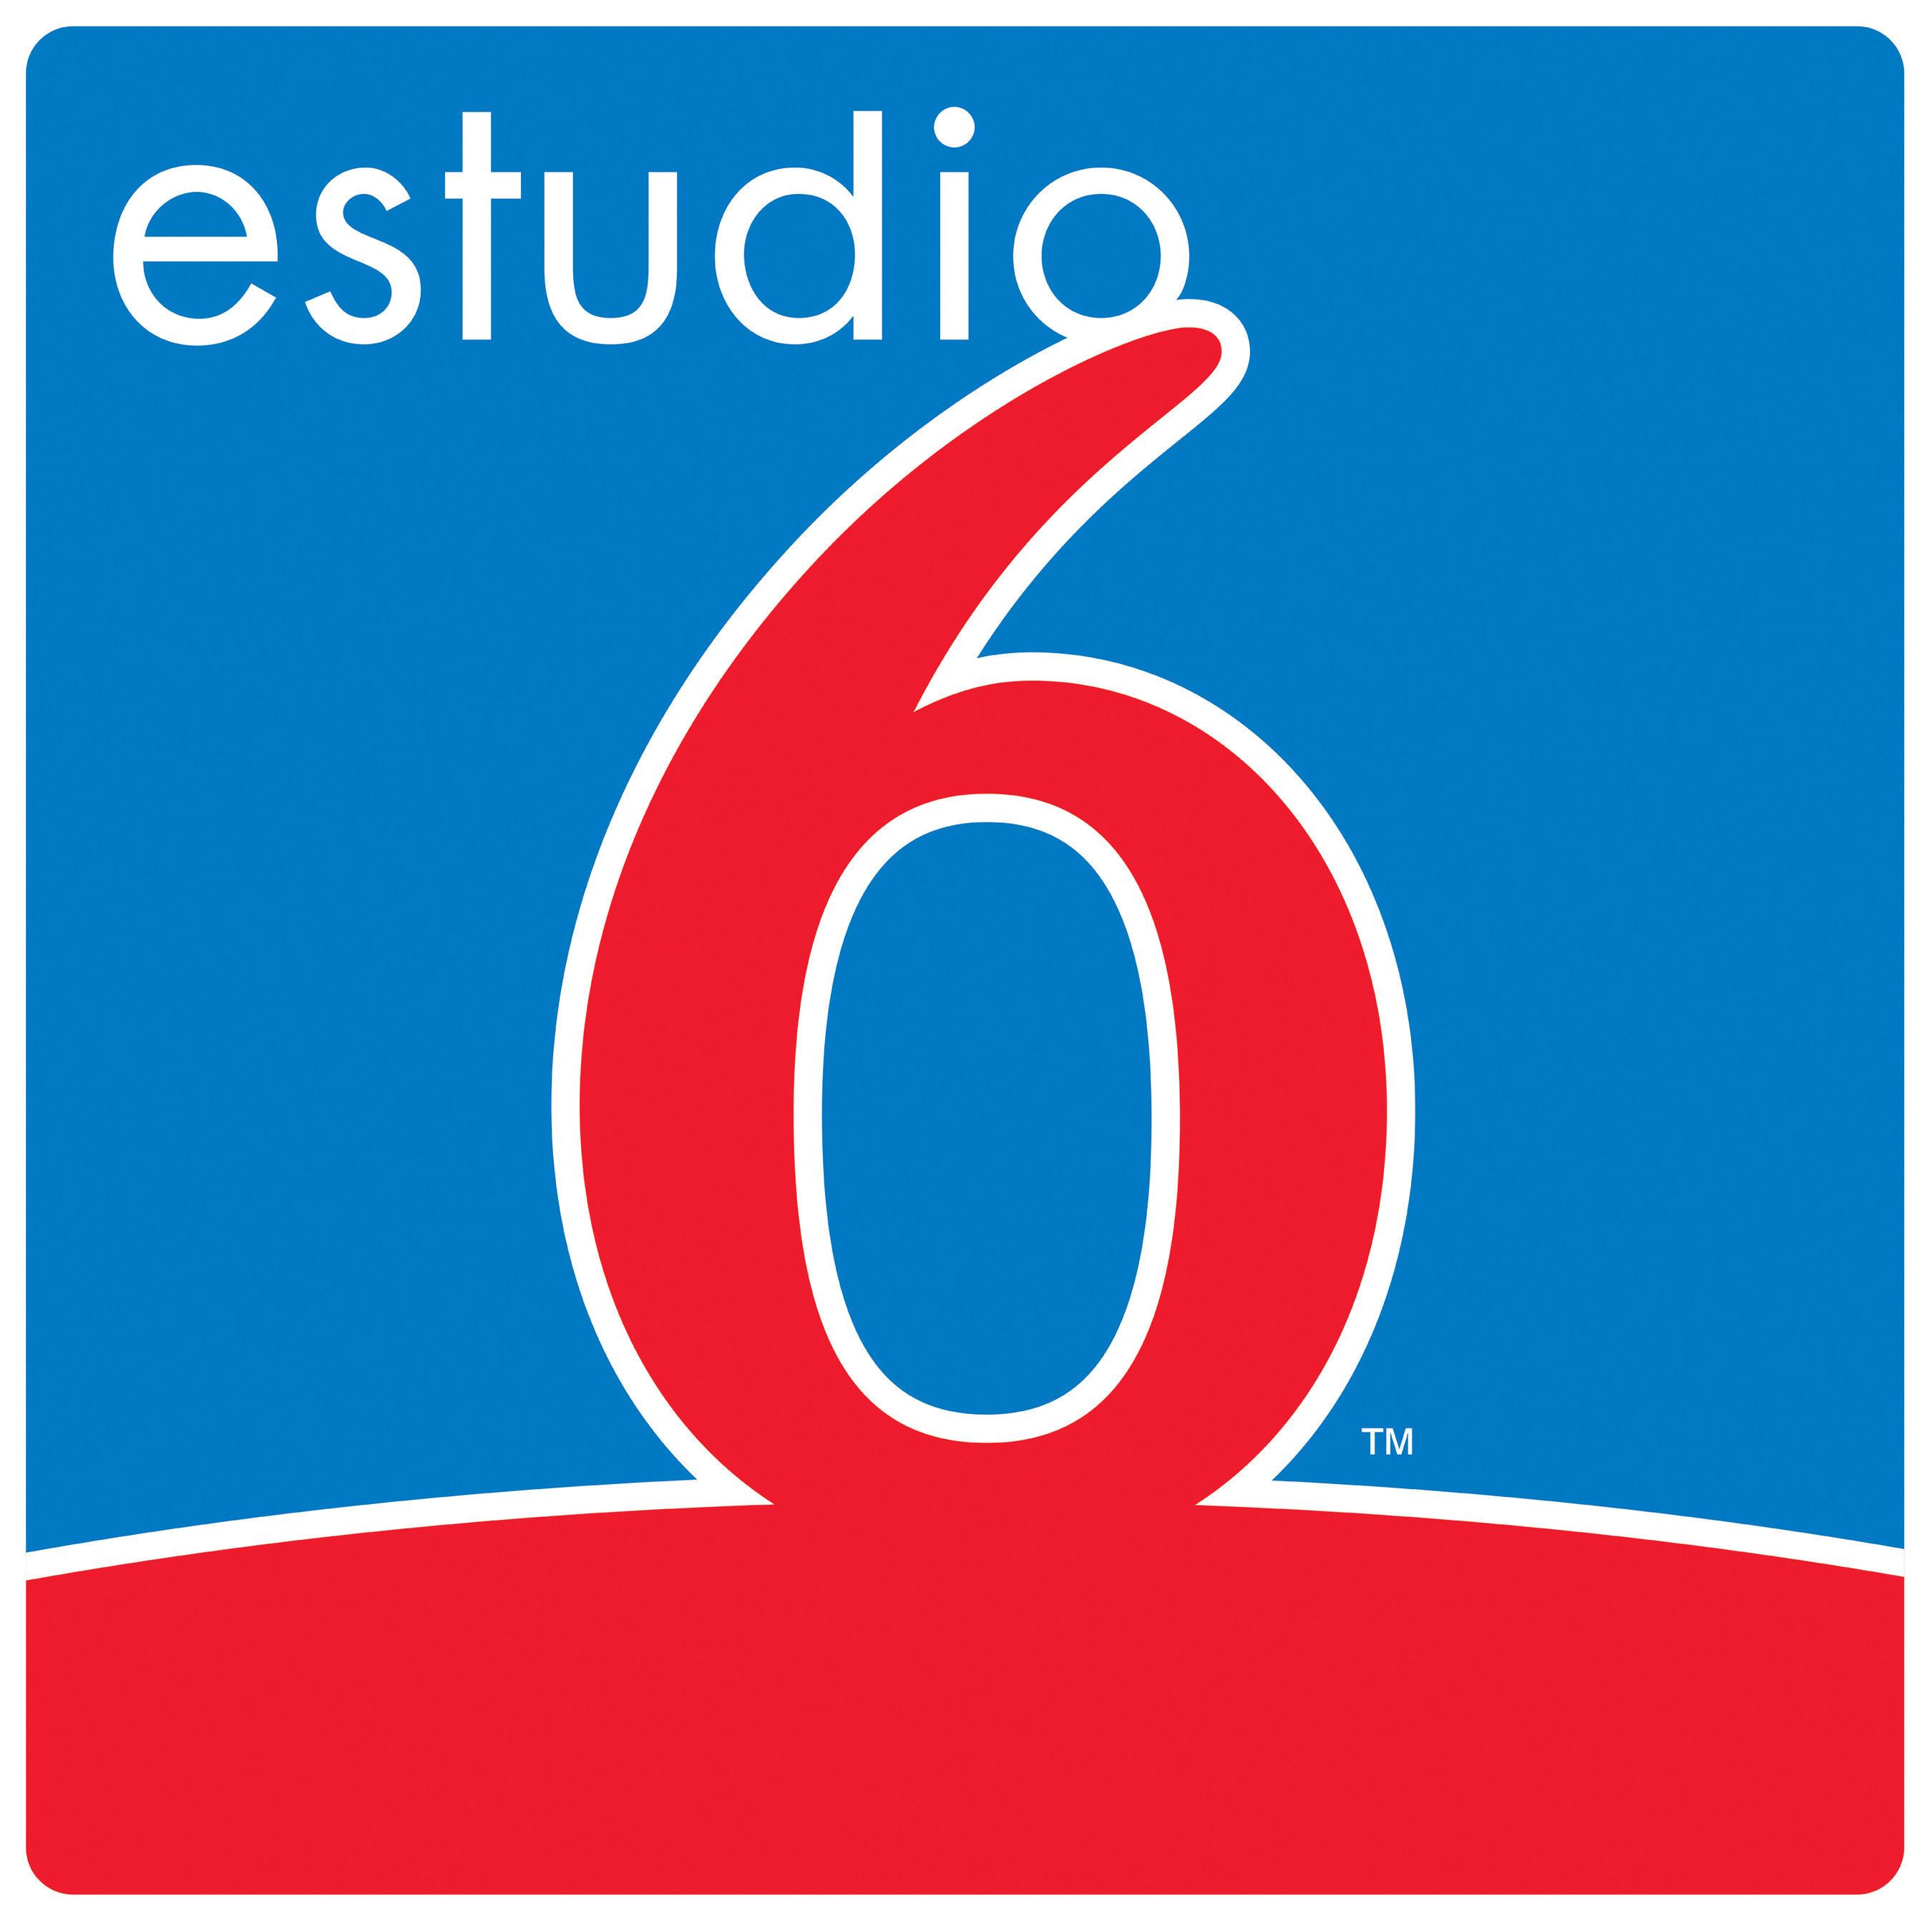 Estudio 6 logo